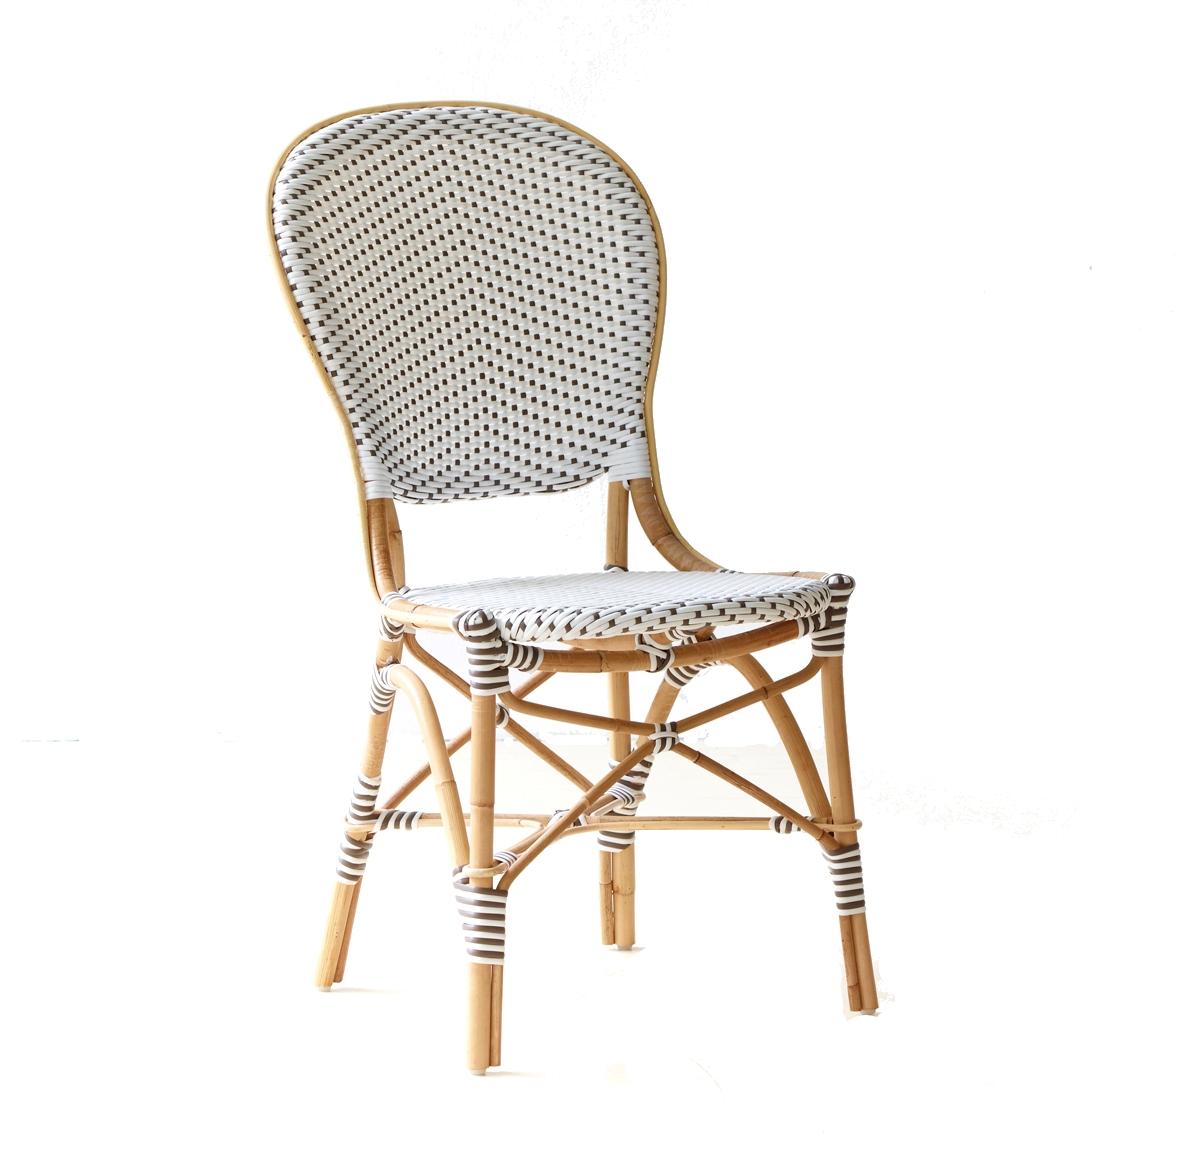 Isabell chair caféstol Affäire vit, Sika-design